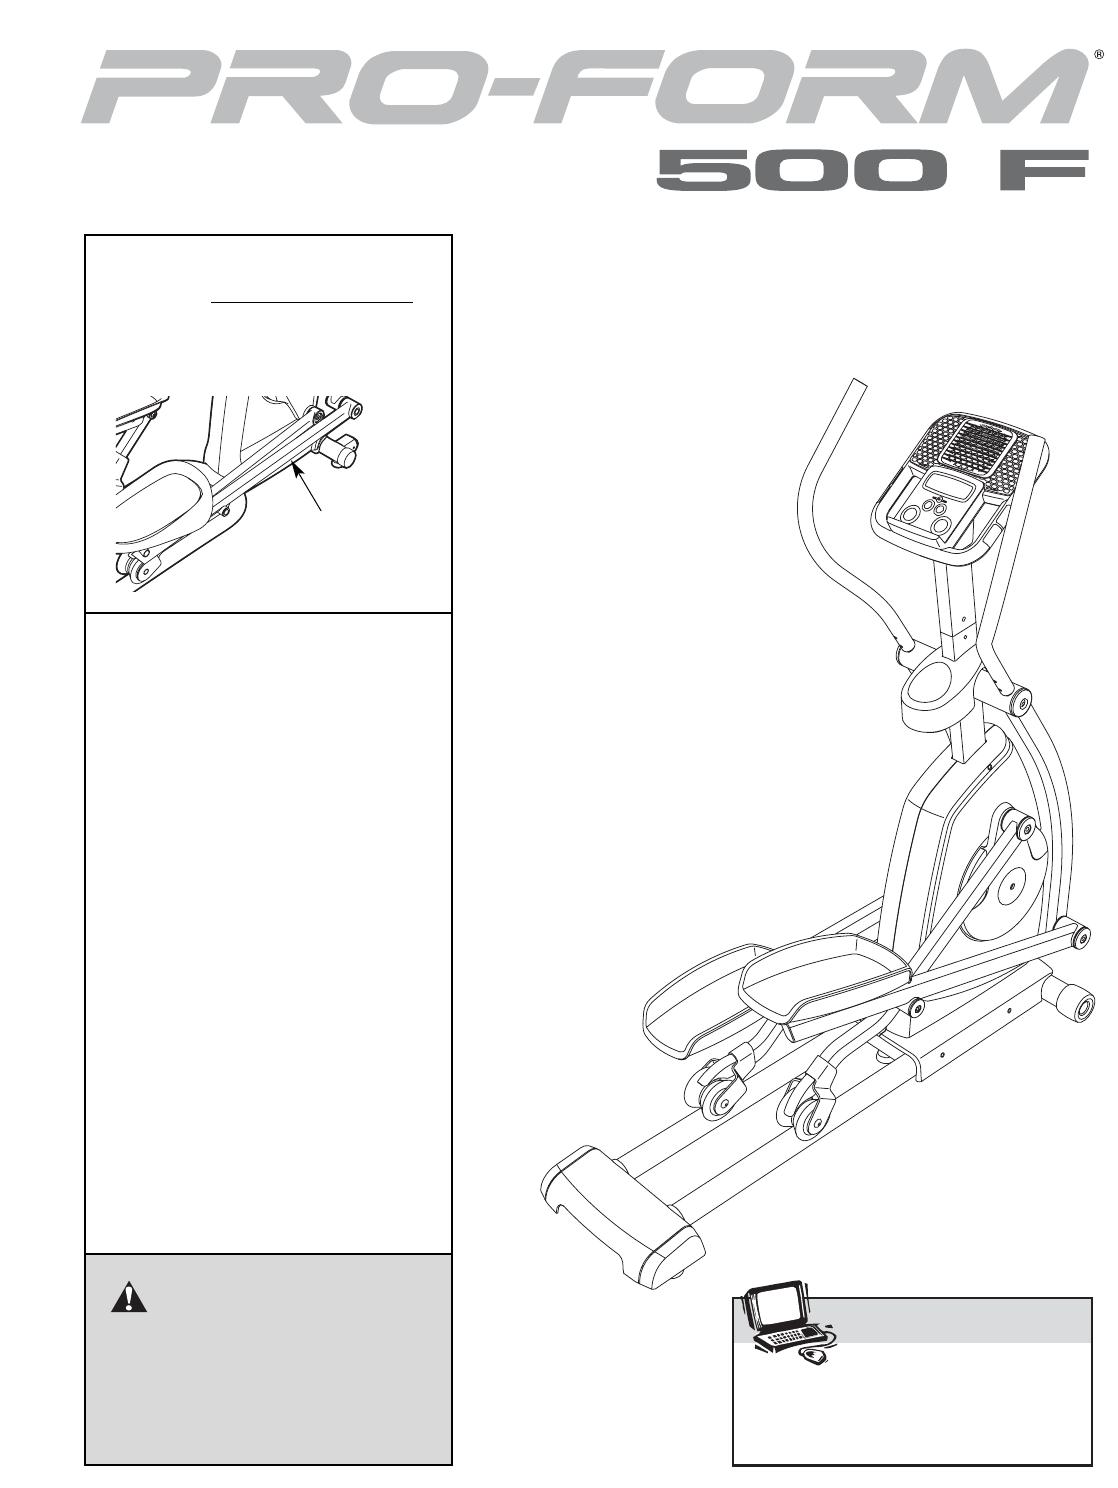 Handleiding Pro Form 500f Pfel54907 Pagina 1 Van 24 English Proform Treadmill Wiring Diagram Caution